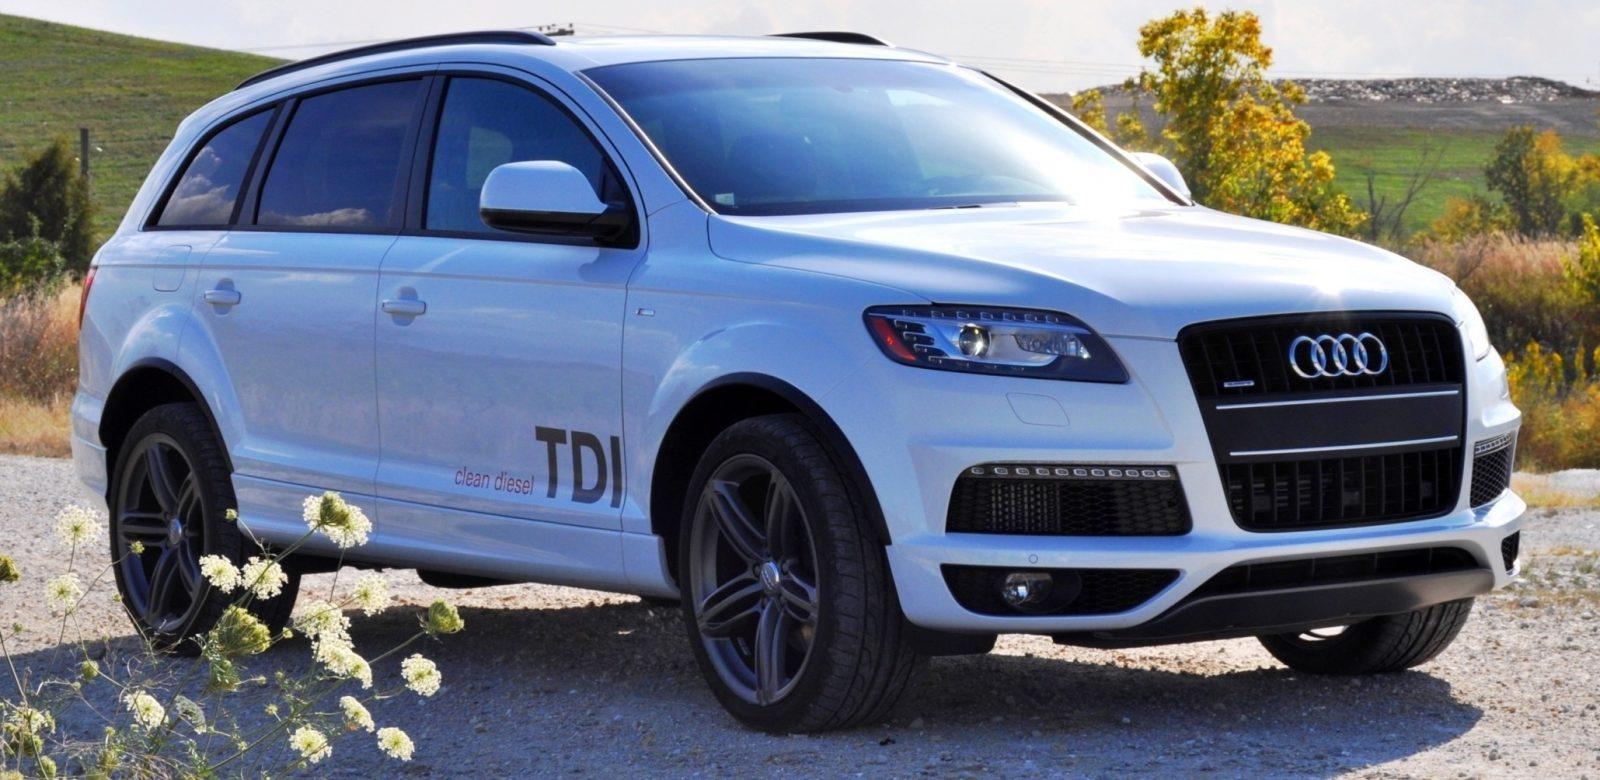 2014 Audi Q7 TDI S-line Plus - Carrara White 8